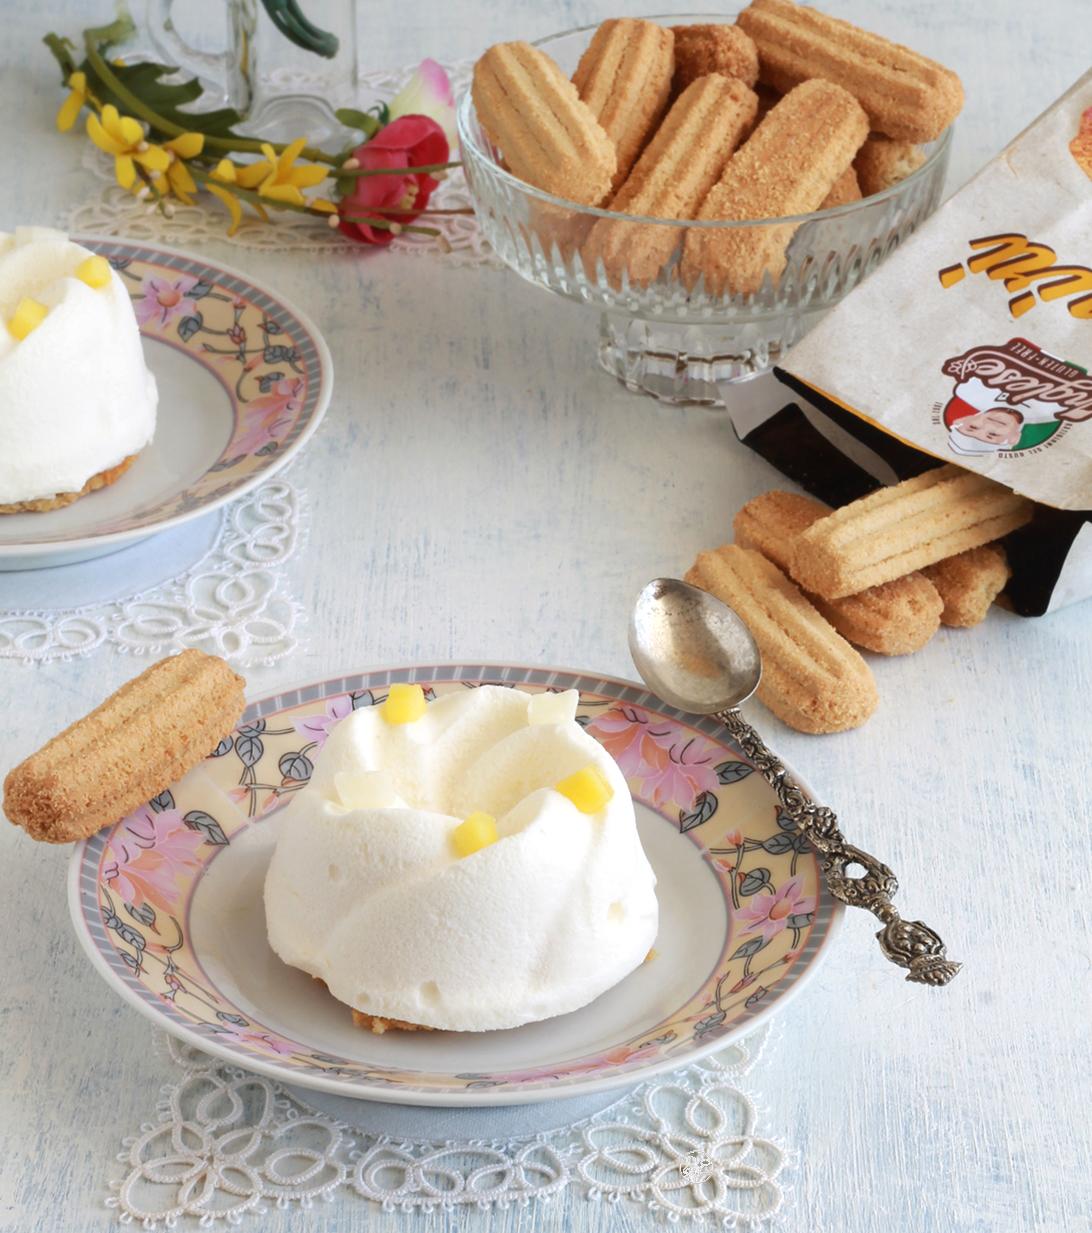 Mousse al cocco e mango senza glutine - La Cassata Celiaca